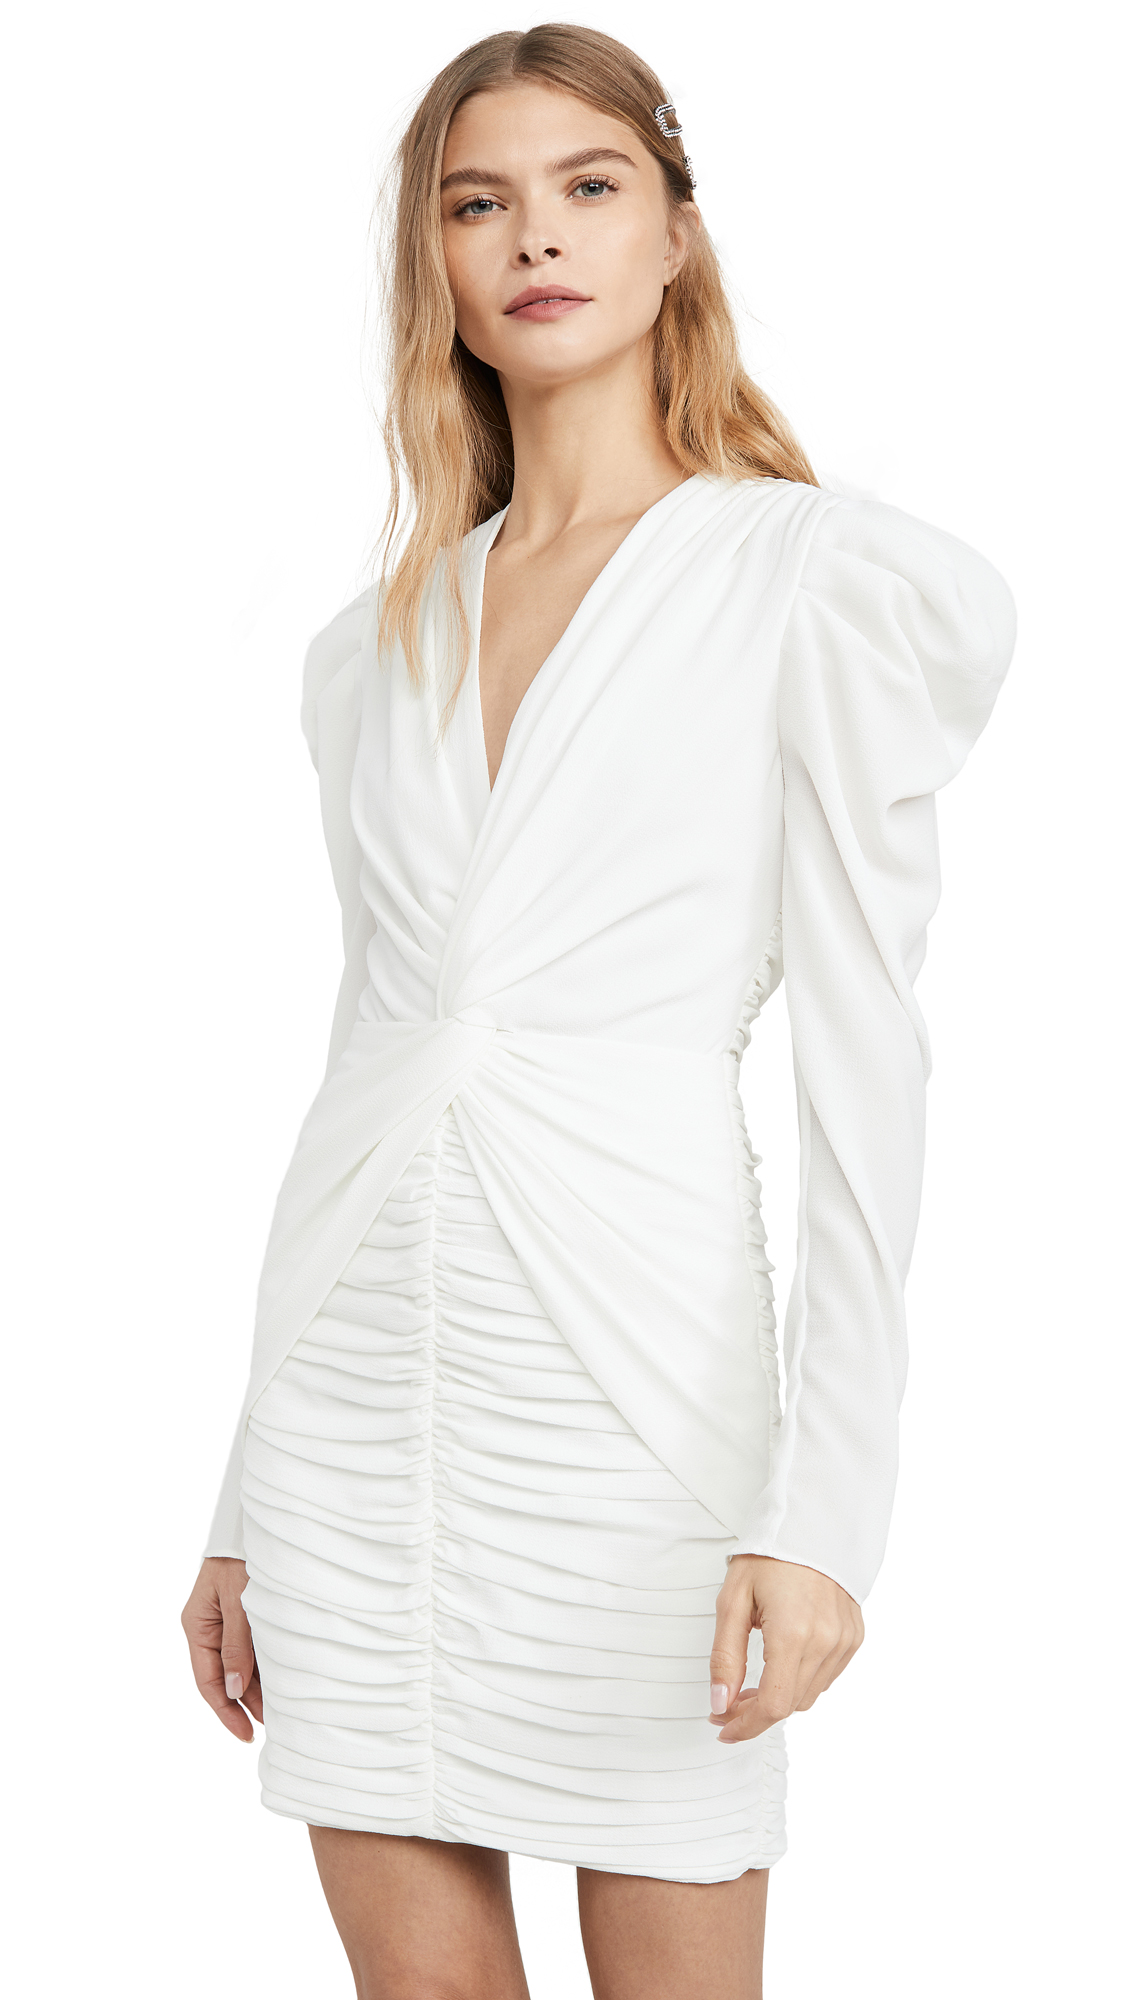 Misha Collection Vittoria Dress - 70% Off Sale